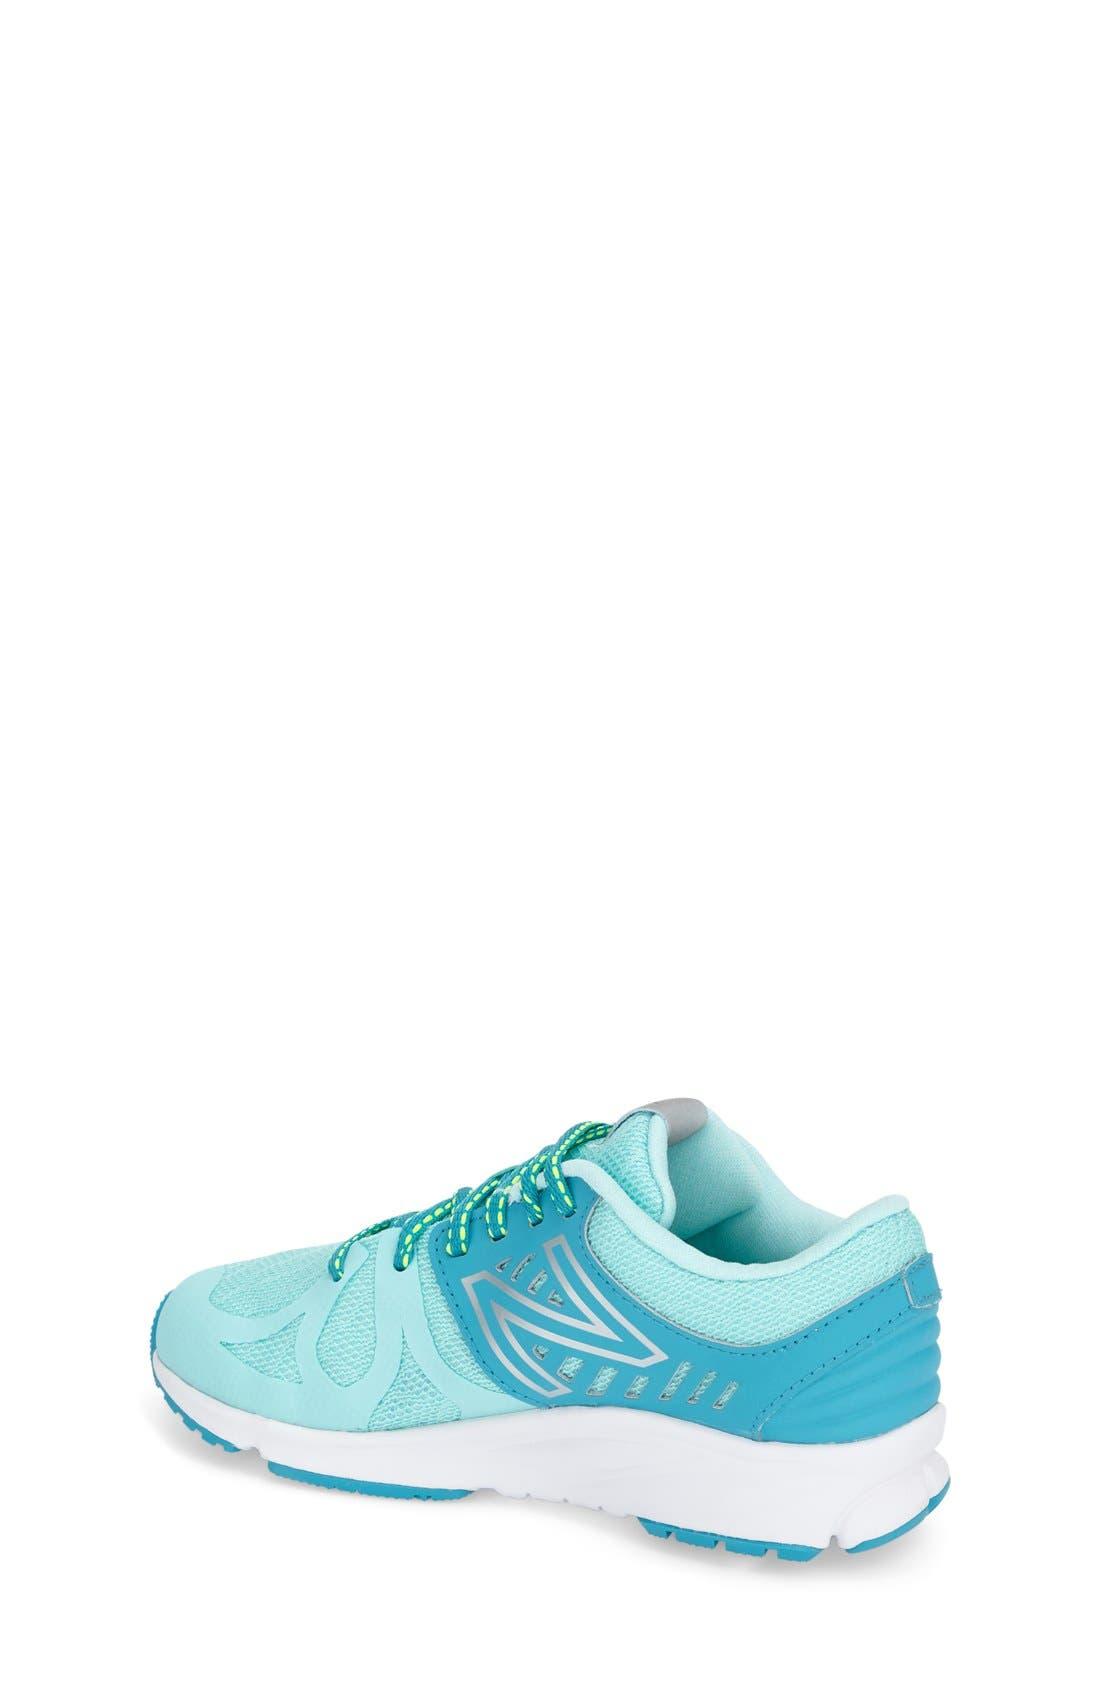 '200 Rush Vazee' Athletic Shoe,                             Alternate thumbnail 2, color,                             Sea Glass